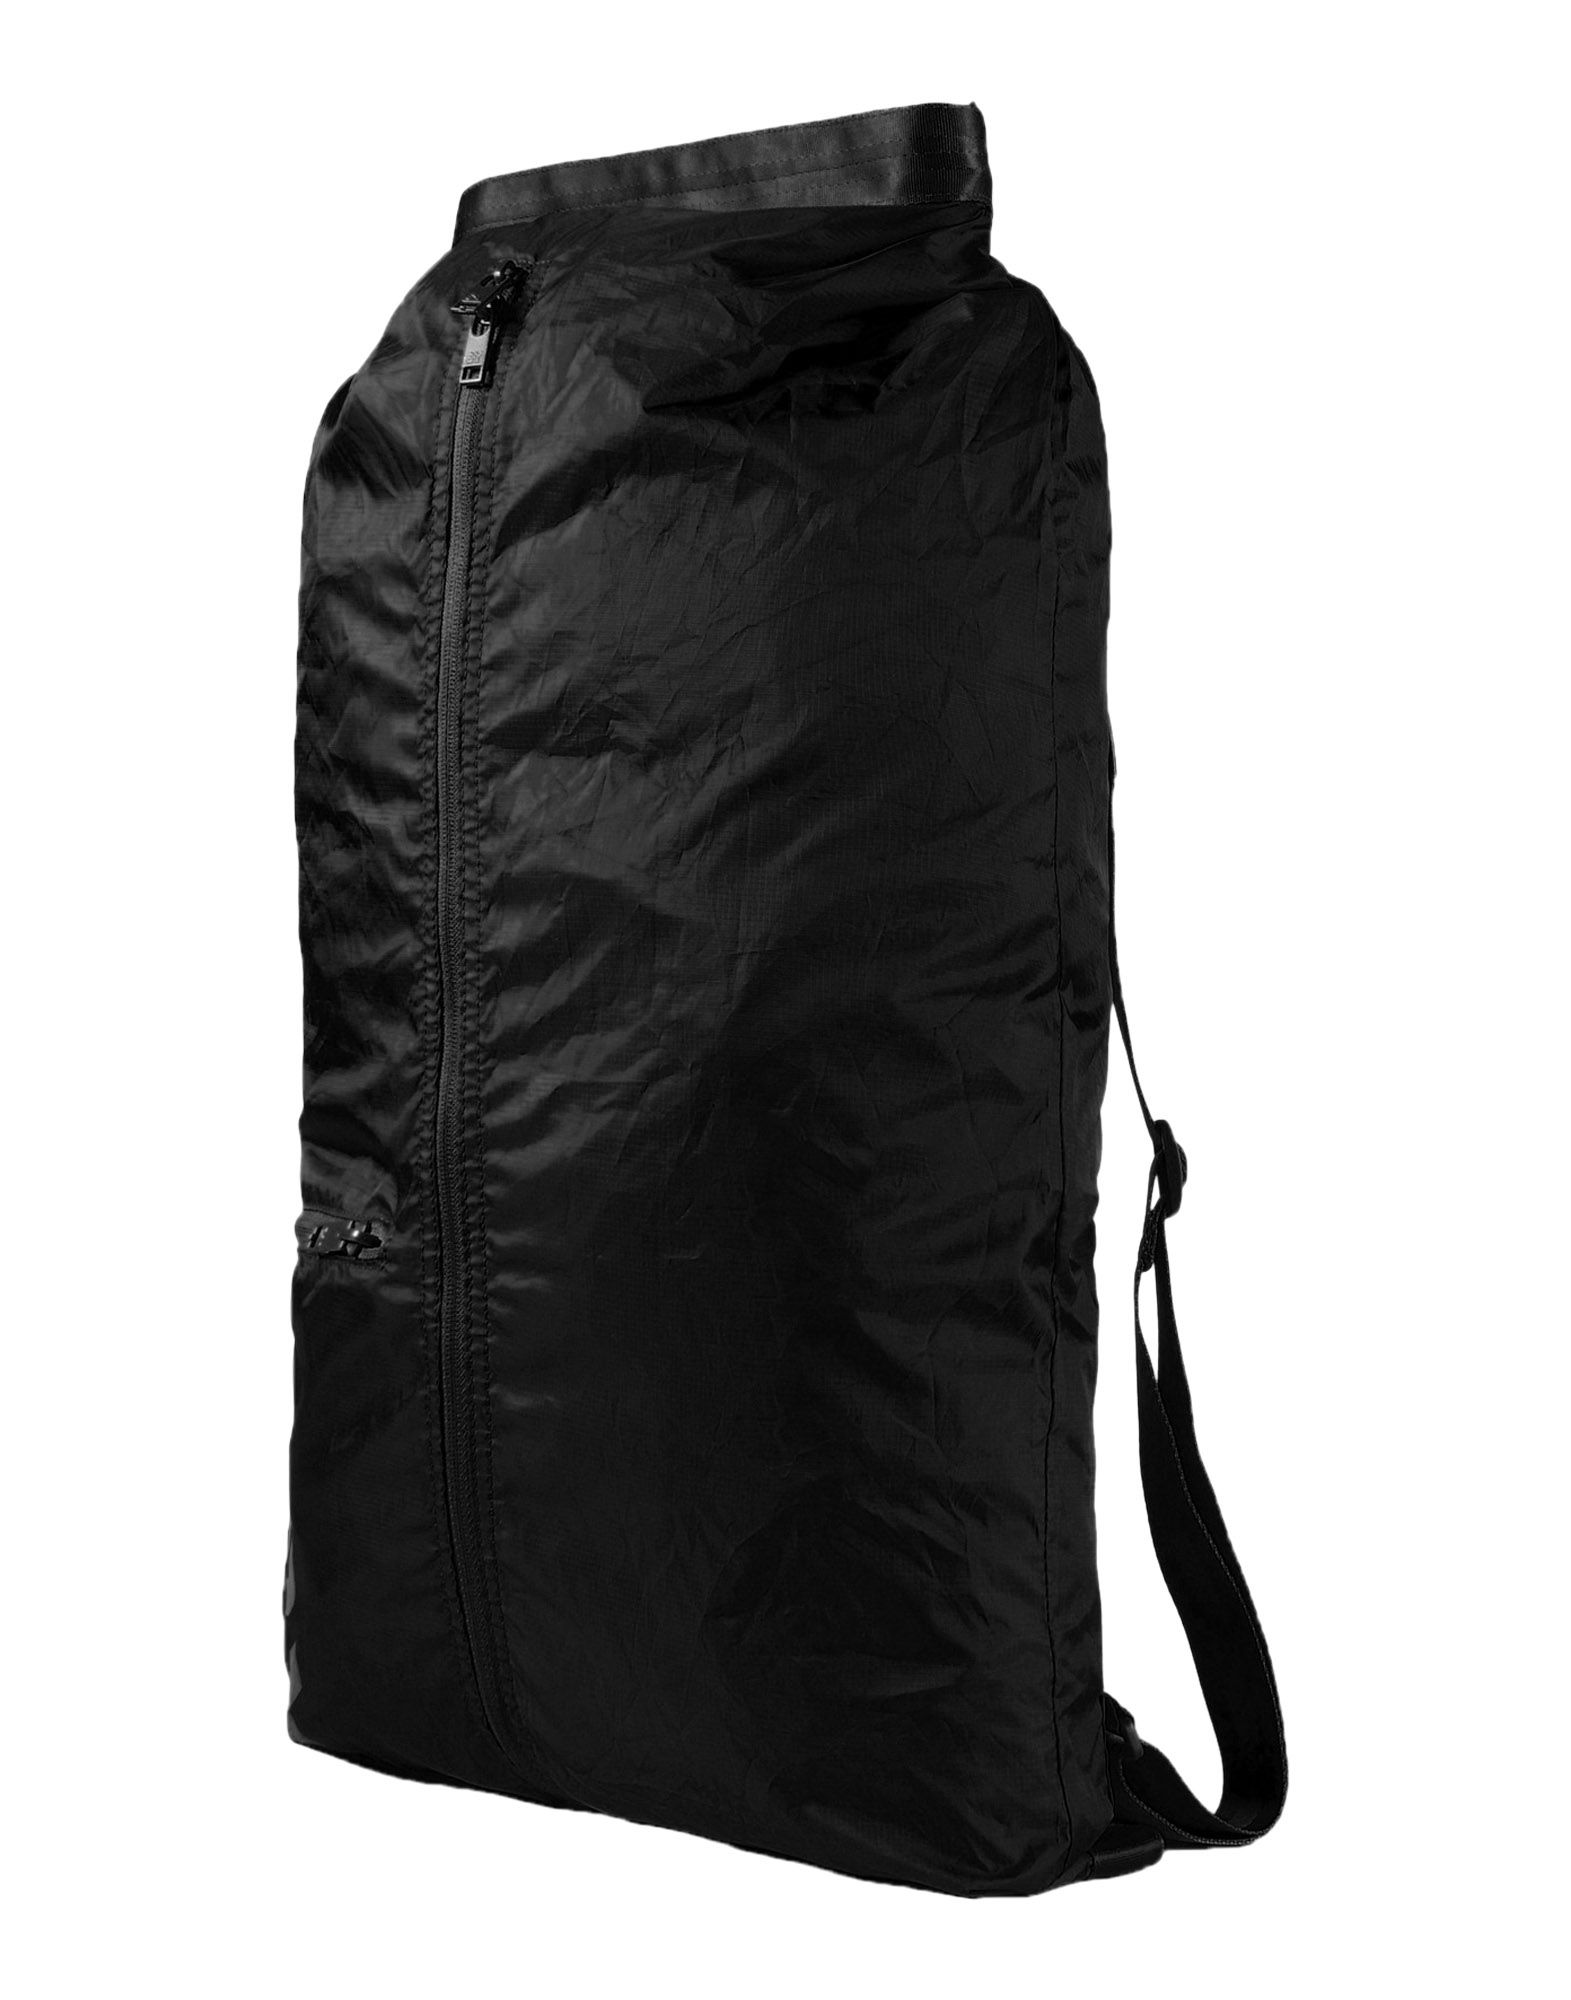 Pierre Darre HANDBAGS - Backpacks & Fanny packs su YOOX.COM Pen4Sc